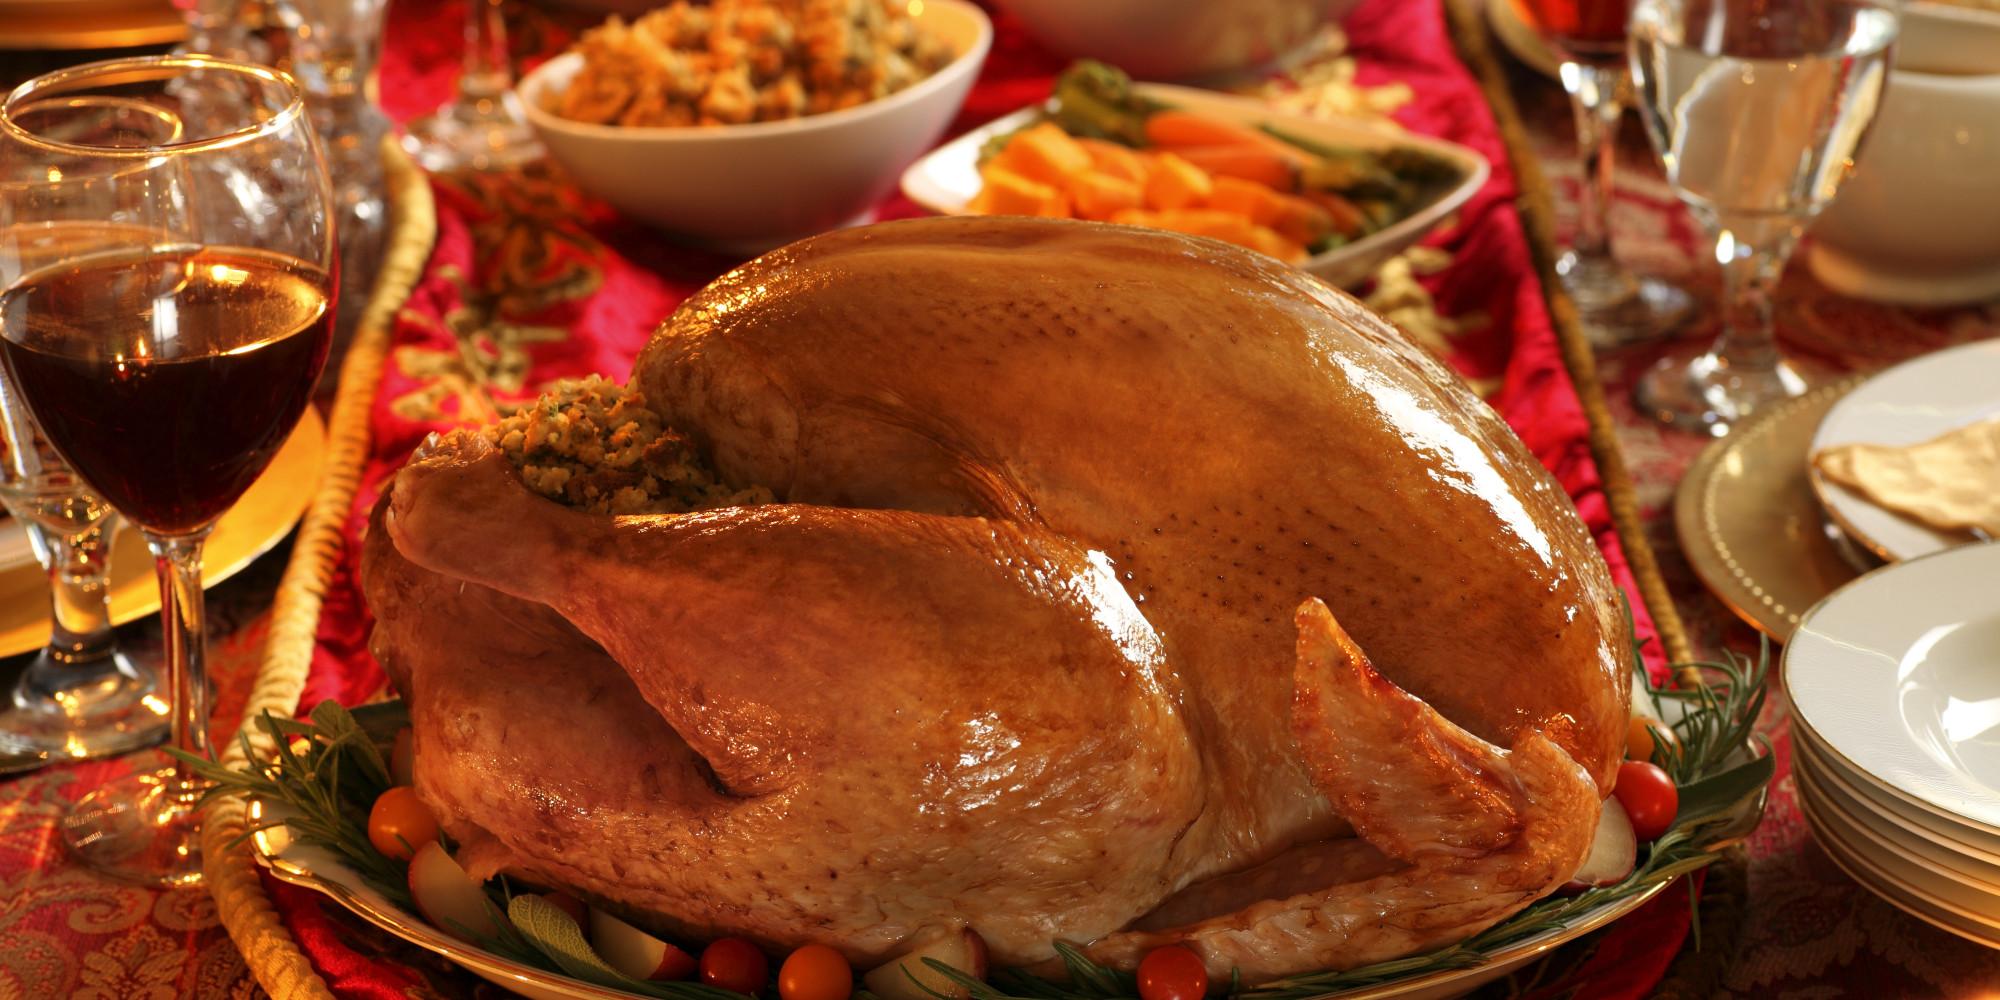 turkeyandwine